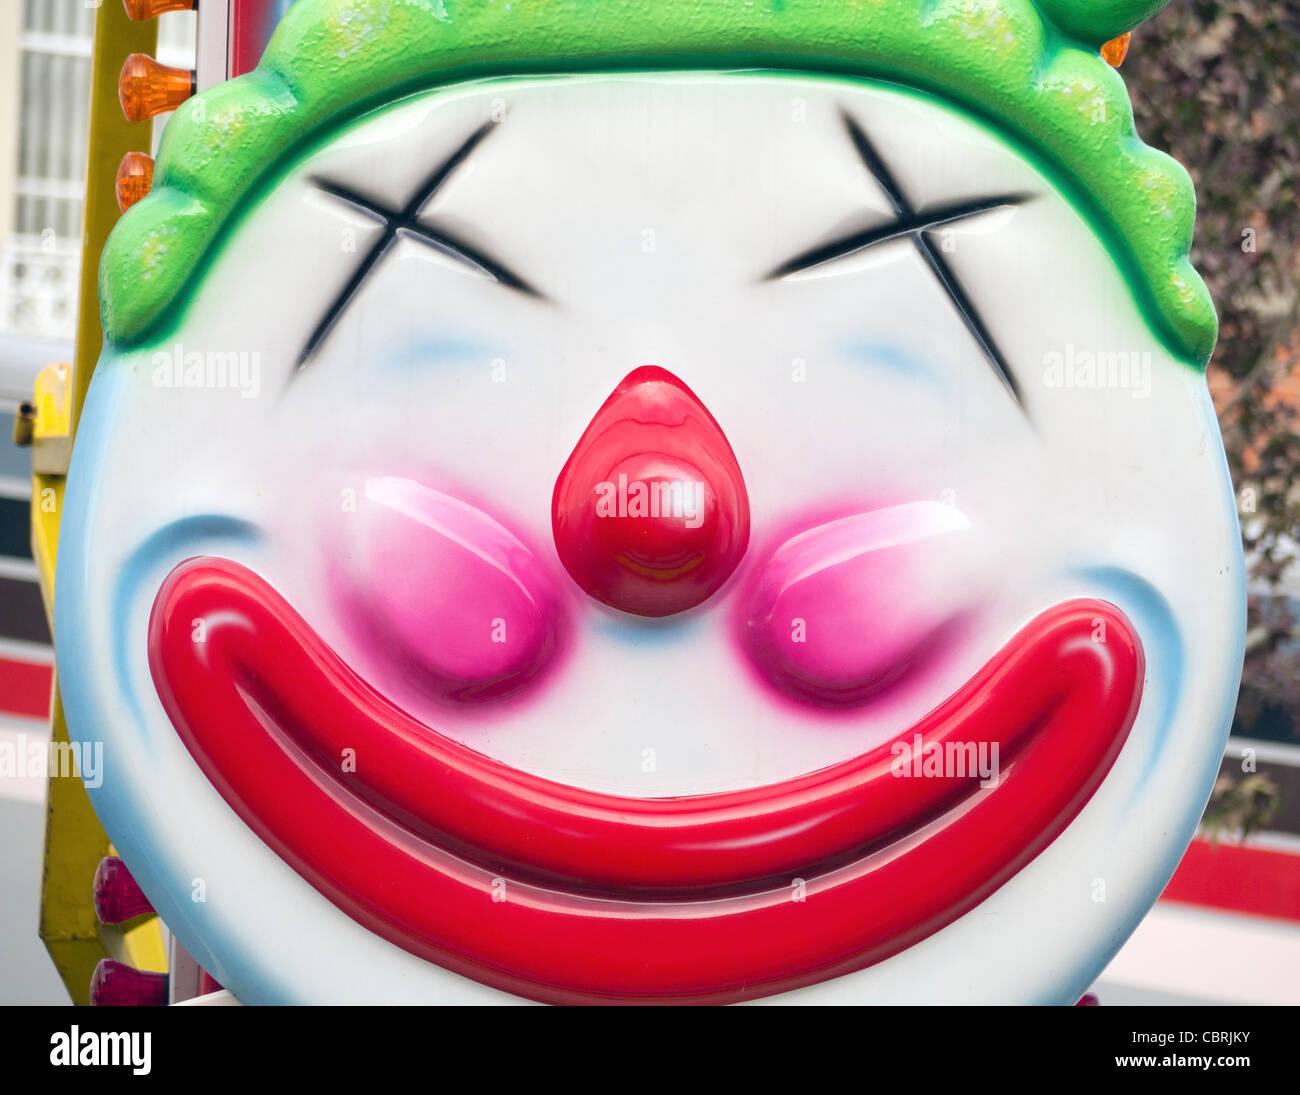 Kitsch clown 3 - Abingdon Street Fair 2011 - Stock Image